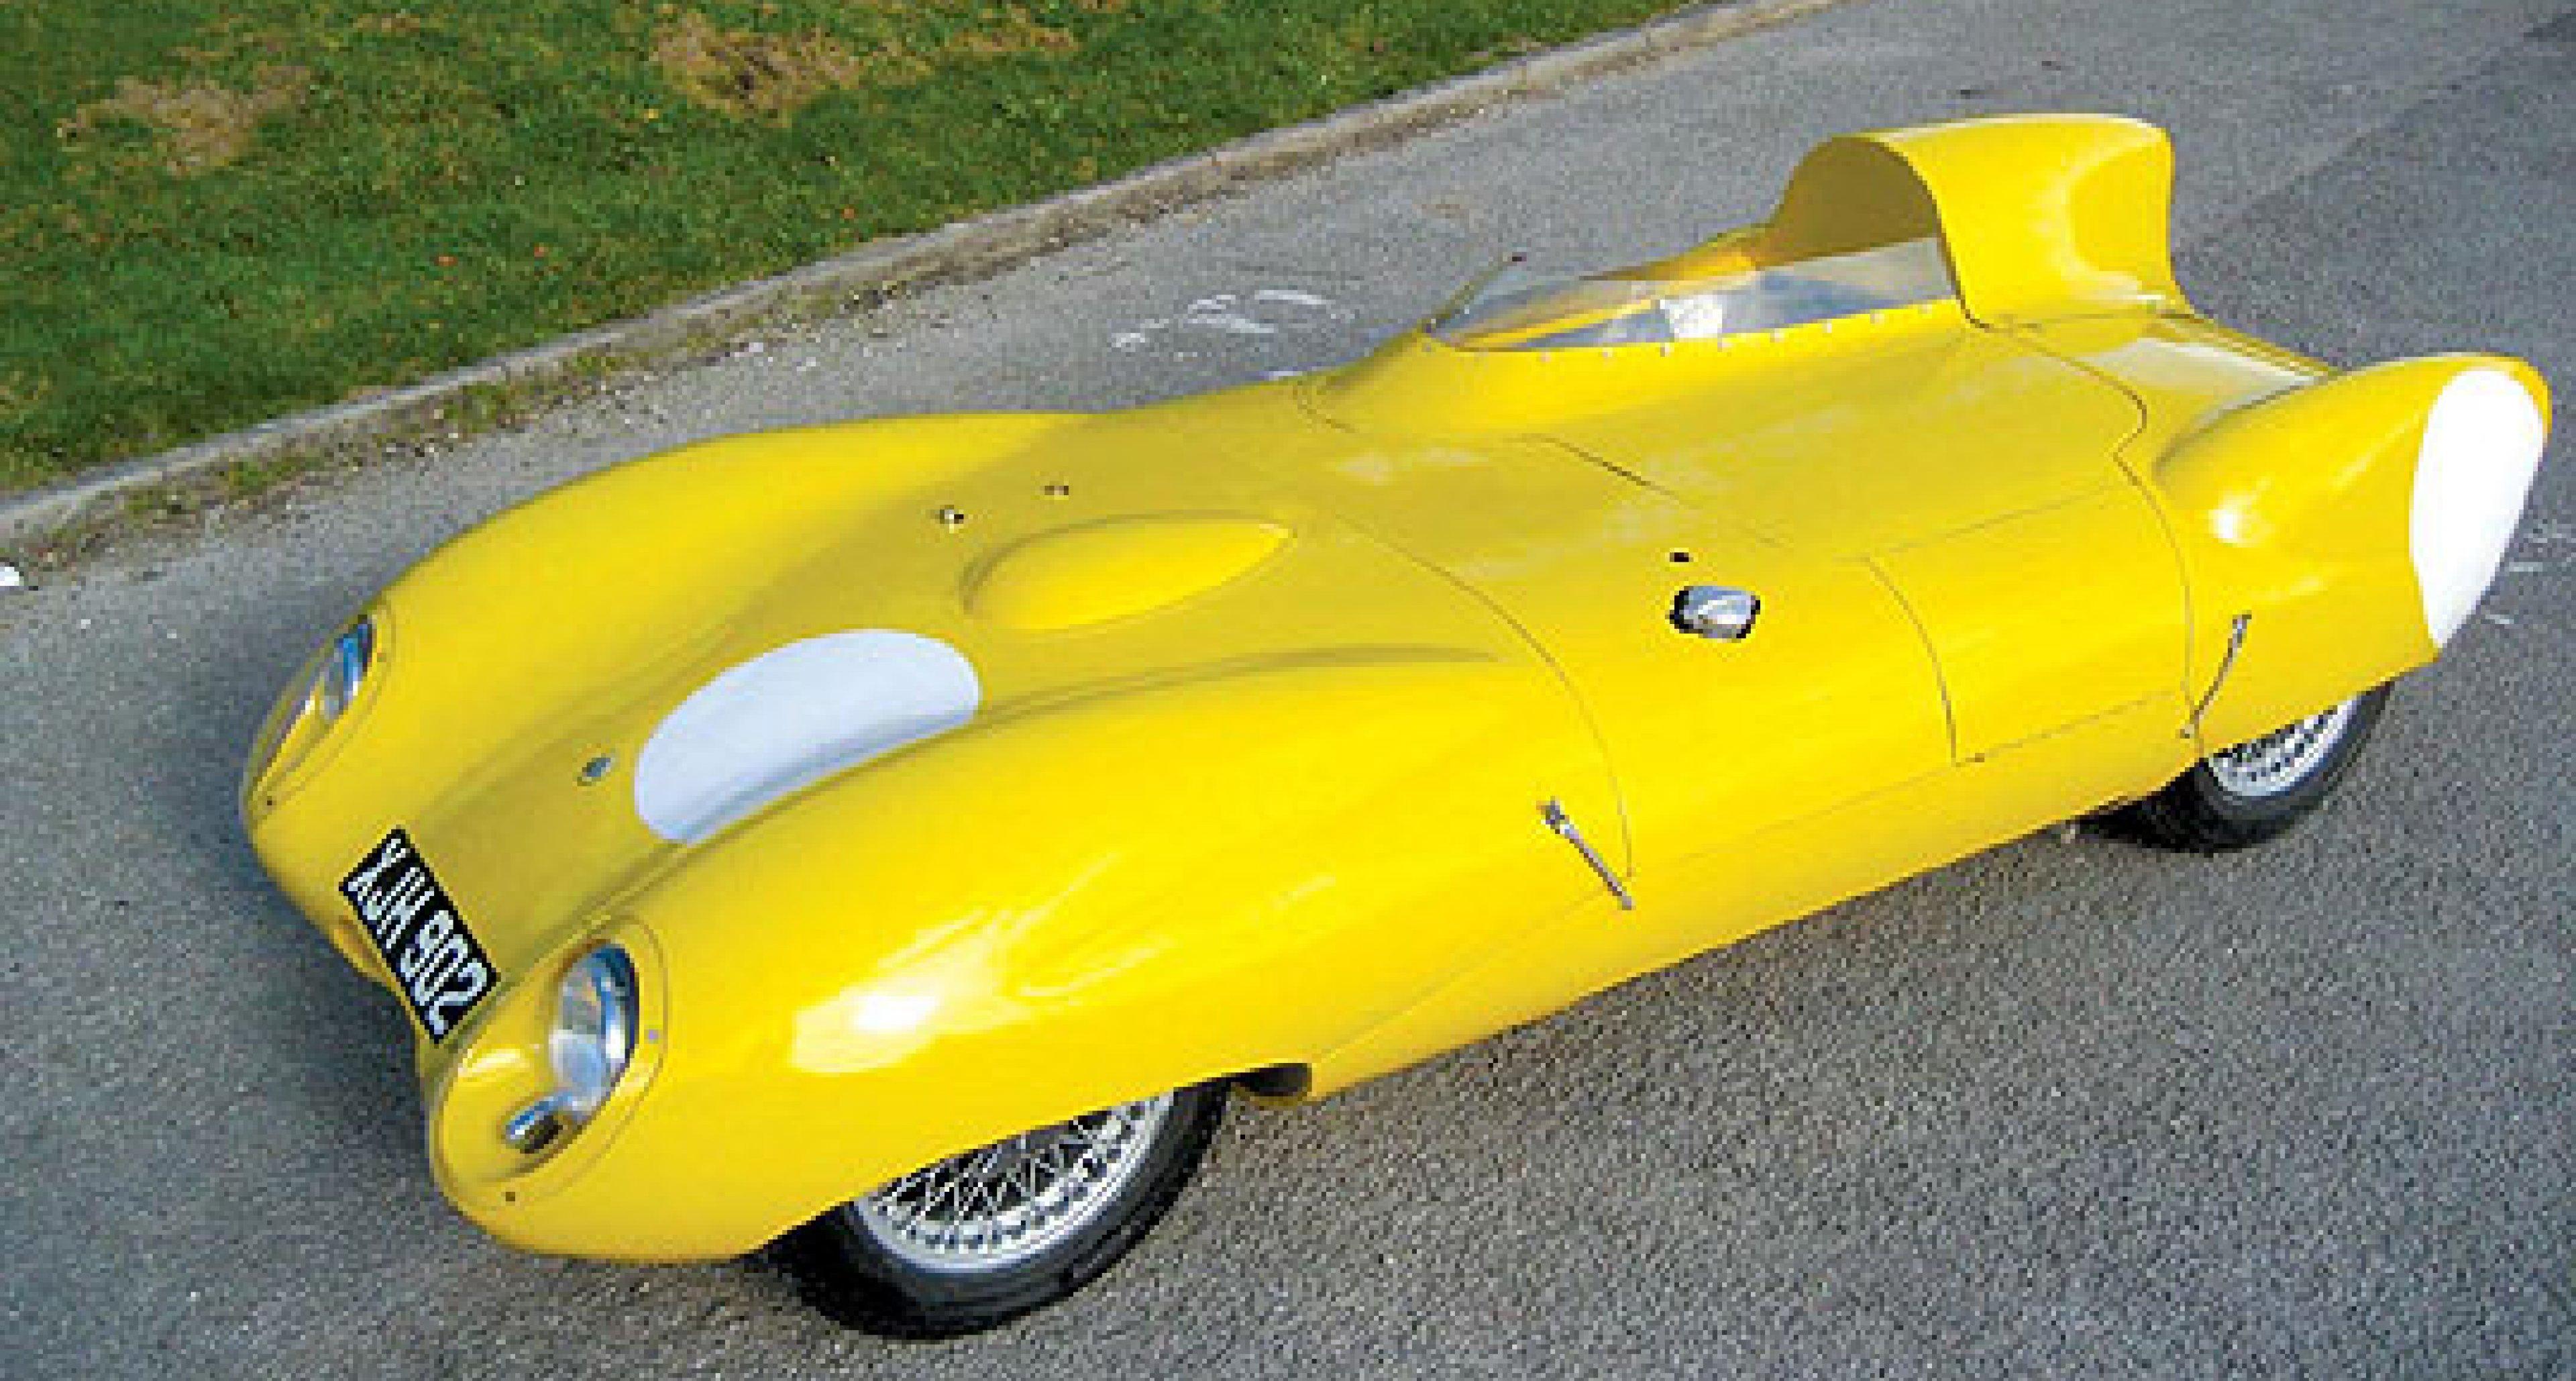 Coys  at The Autosport International Racing Car Show 12th Jan 2008